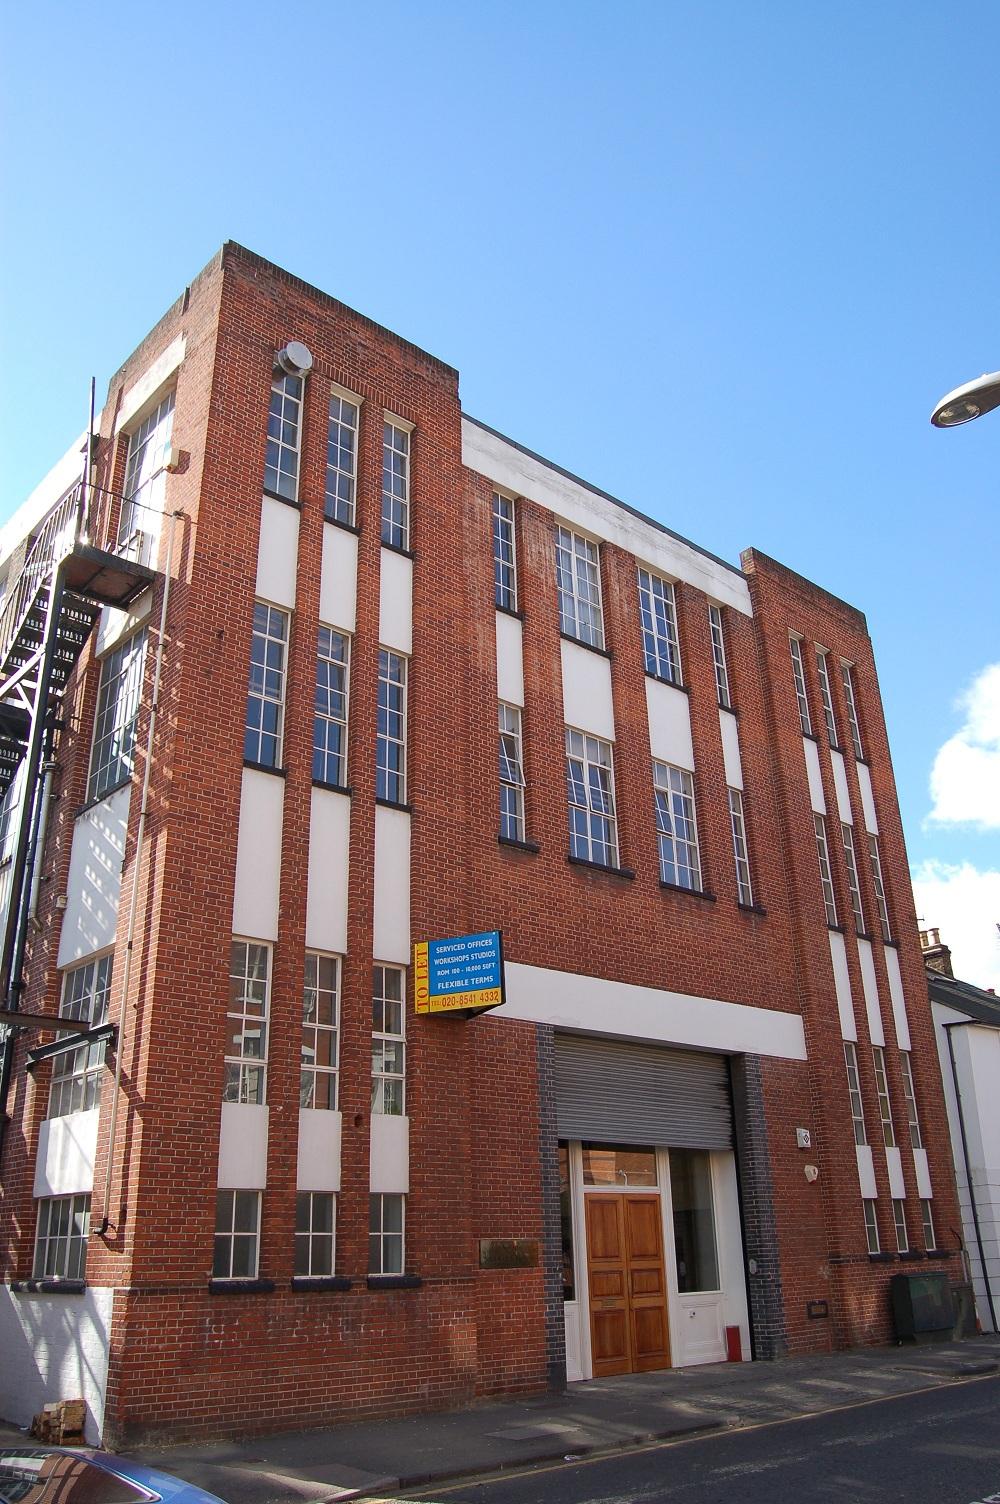 Siddeley House - Canbury Park Road, KT2 - Kingston Upon Thames